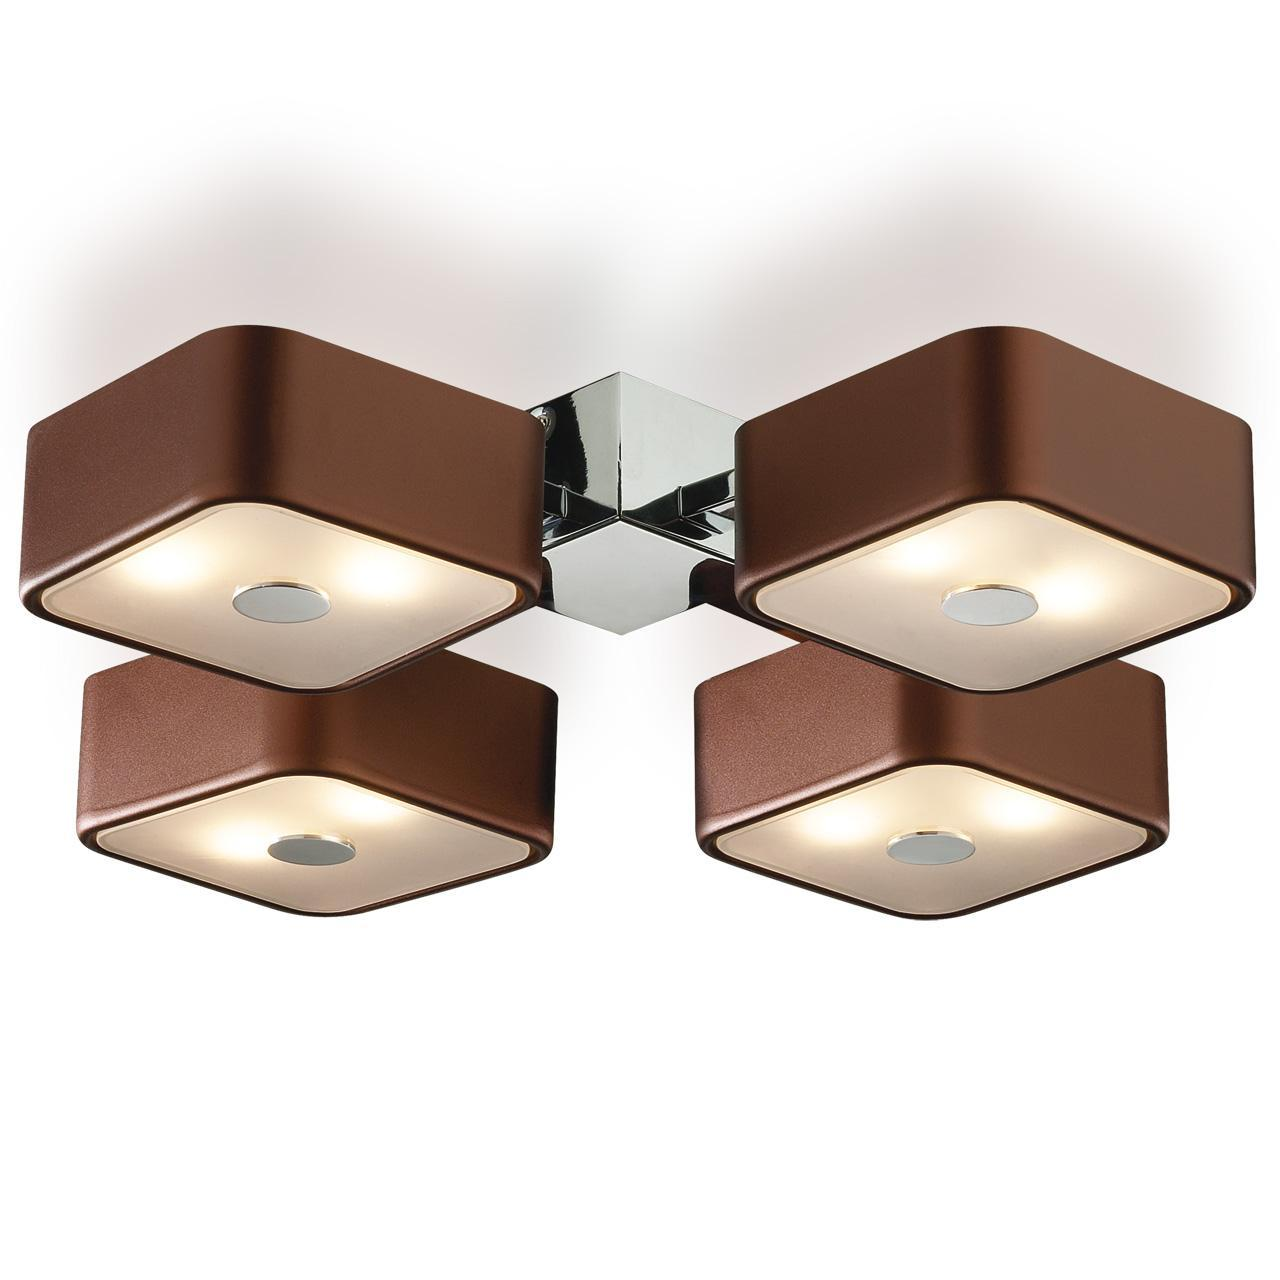 Люстра Odeon Light Turon 2048/8C потолочная потолочная люстра odeon kabris 2934 8c